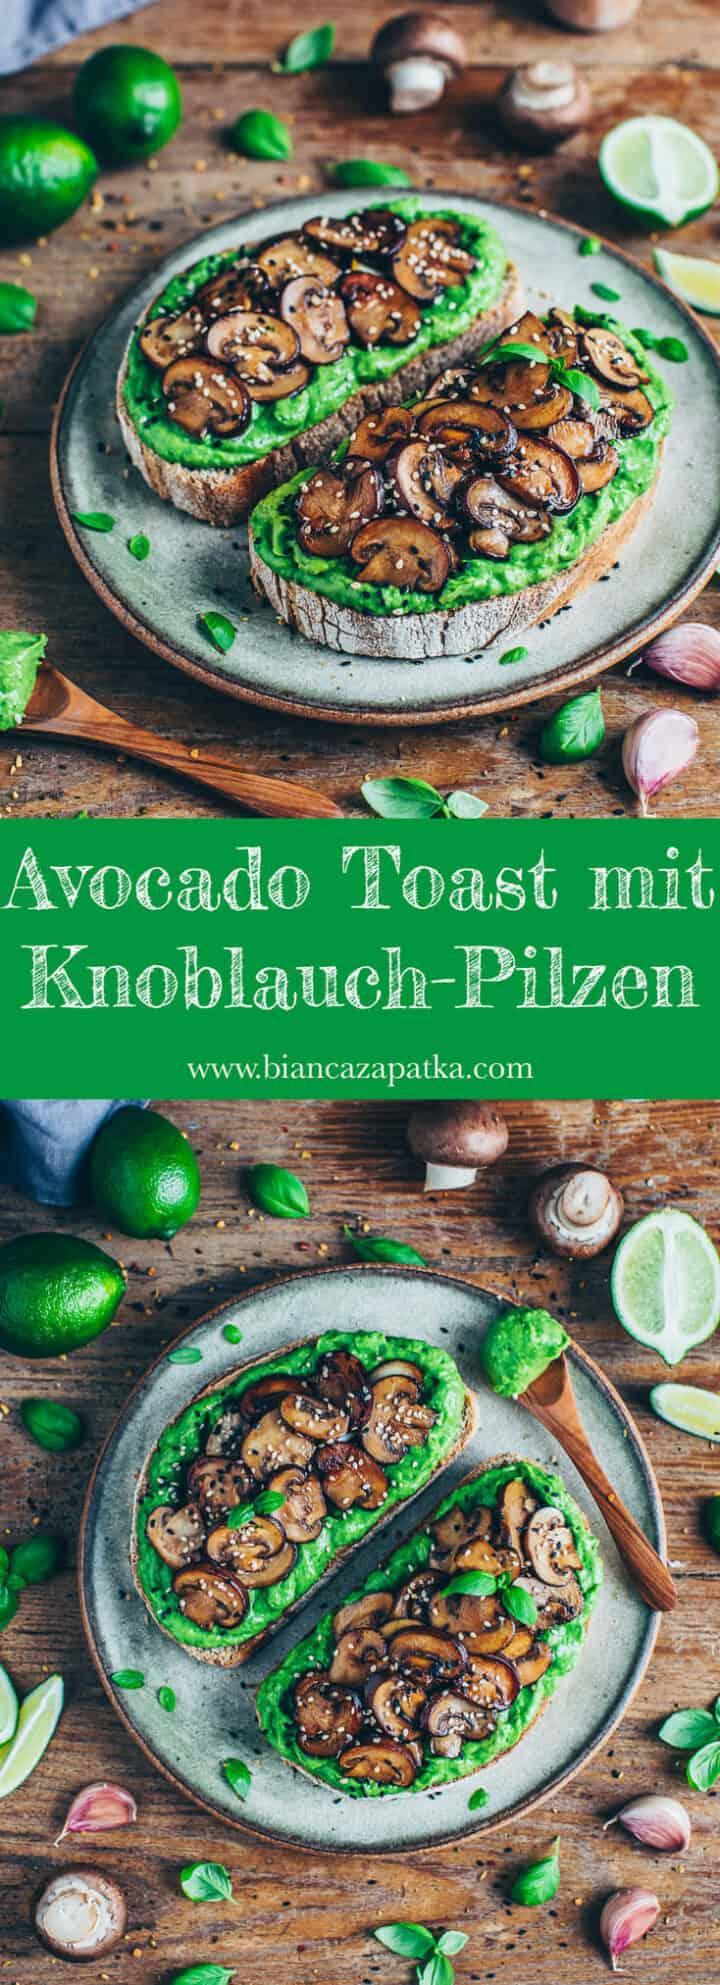 Avocado Toast mit Knoblauch-Pilzen